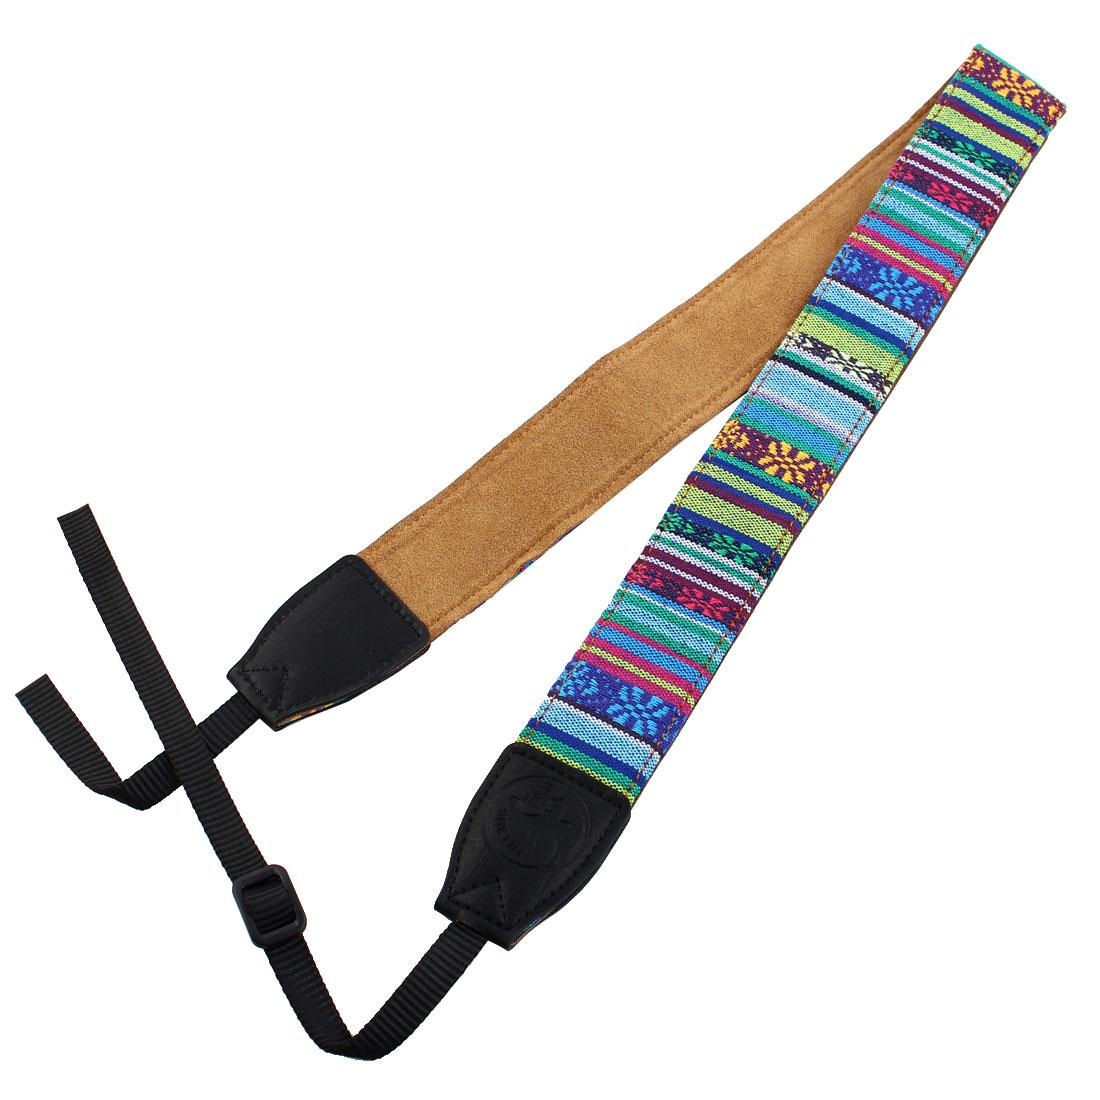 SHETU Authorized Universal Ethnic Customs Camera Shoulder Neck Strap #6 for DSLR